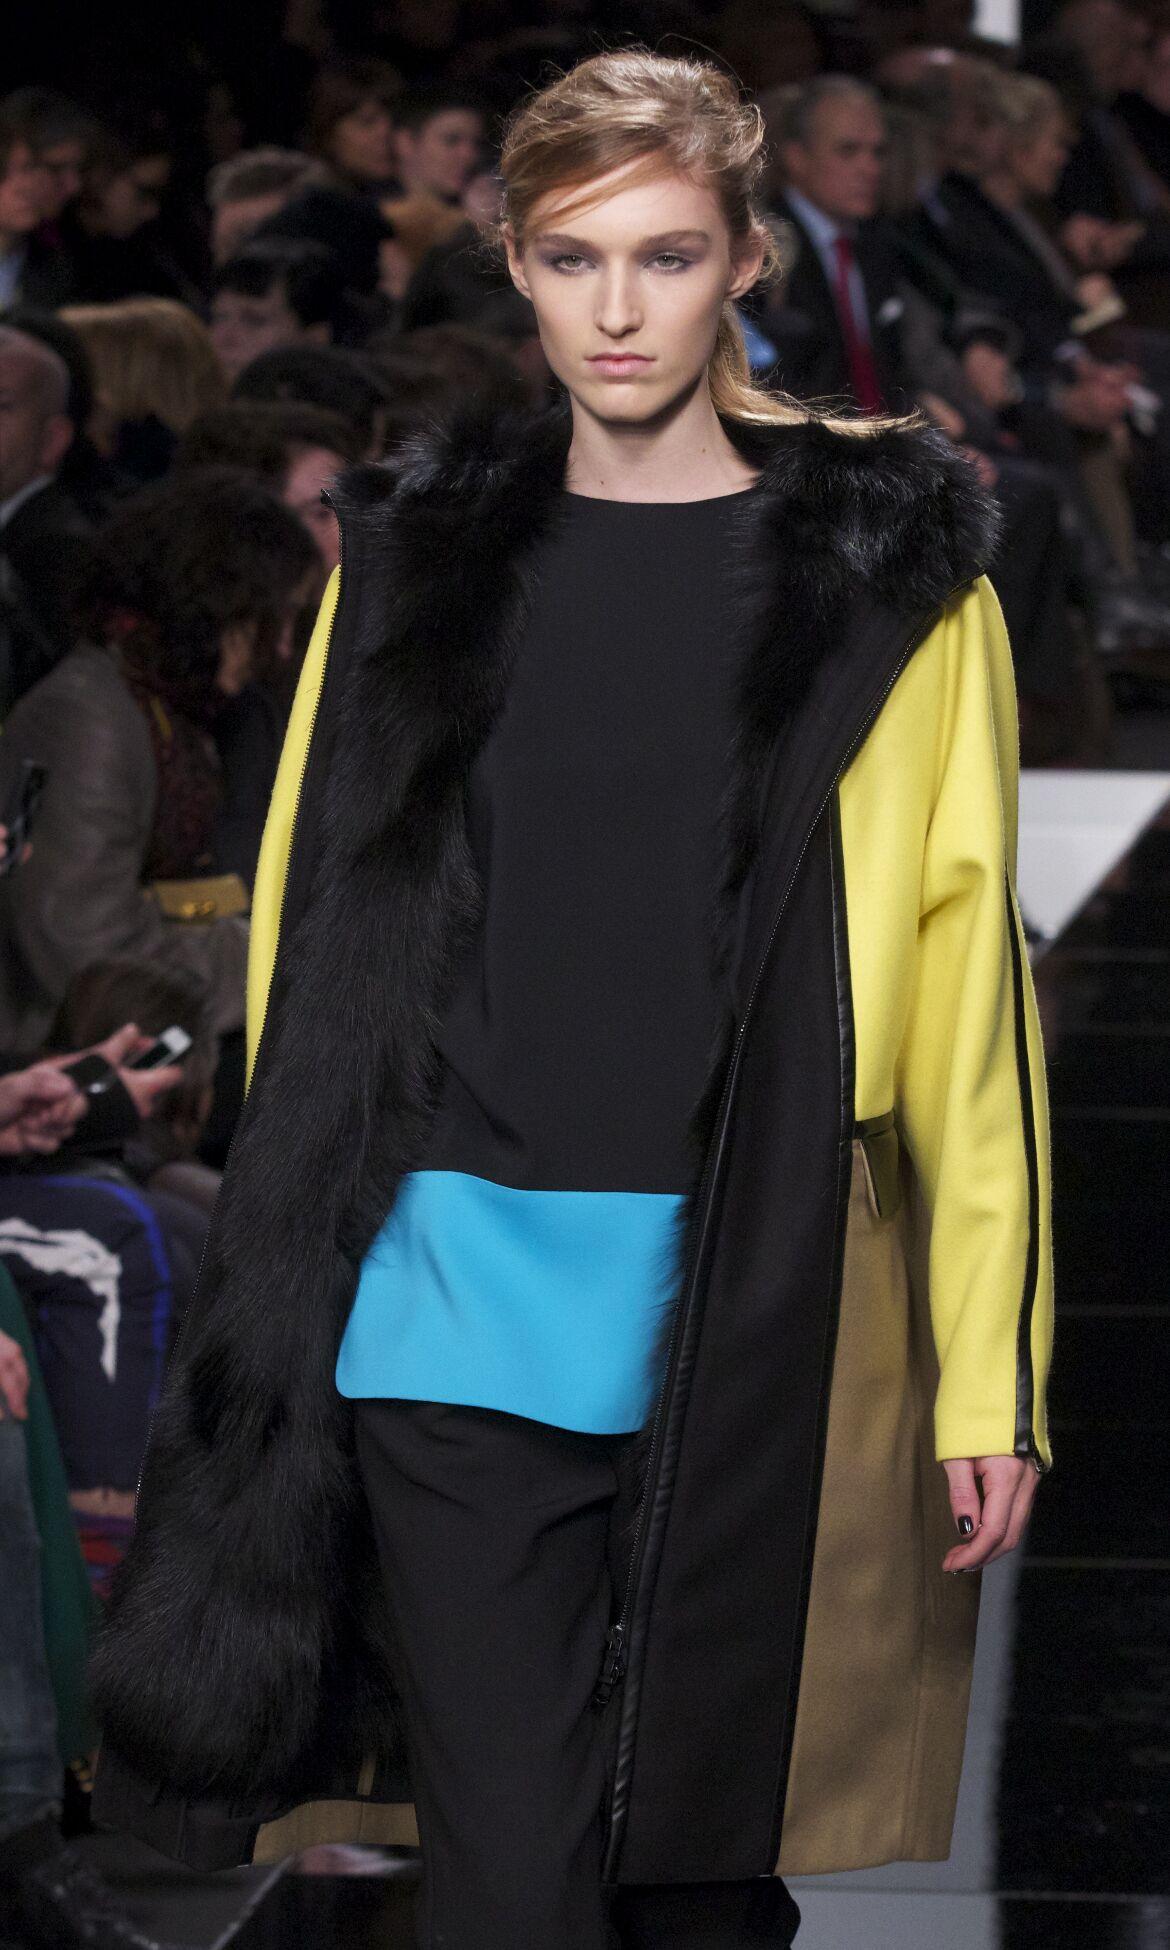 Fashion Woman Model Iceberg Catwalk